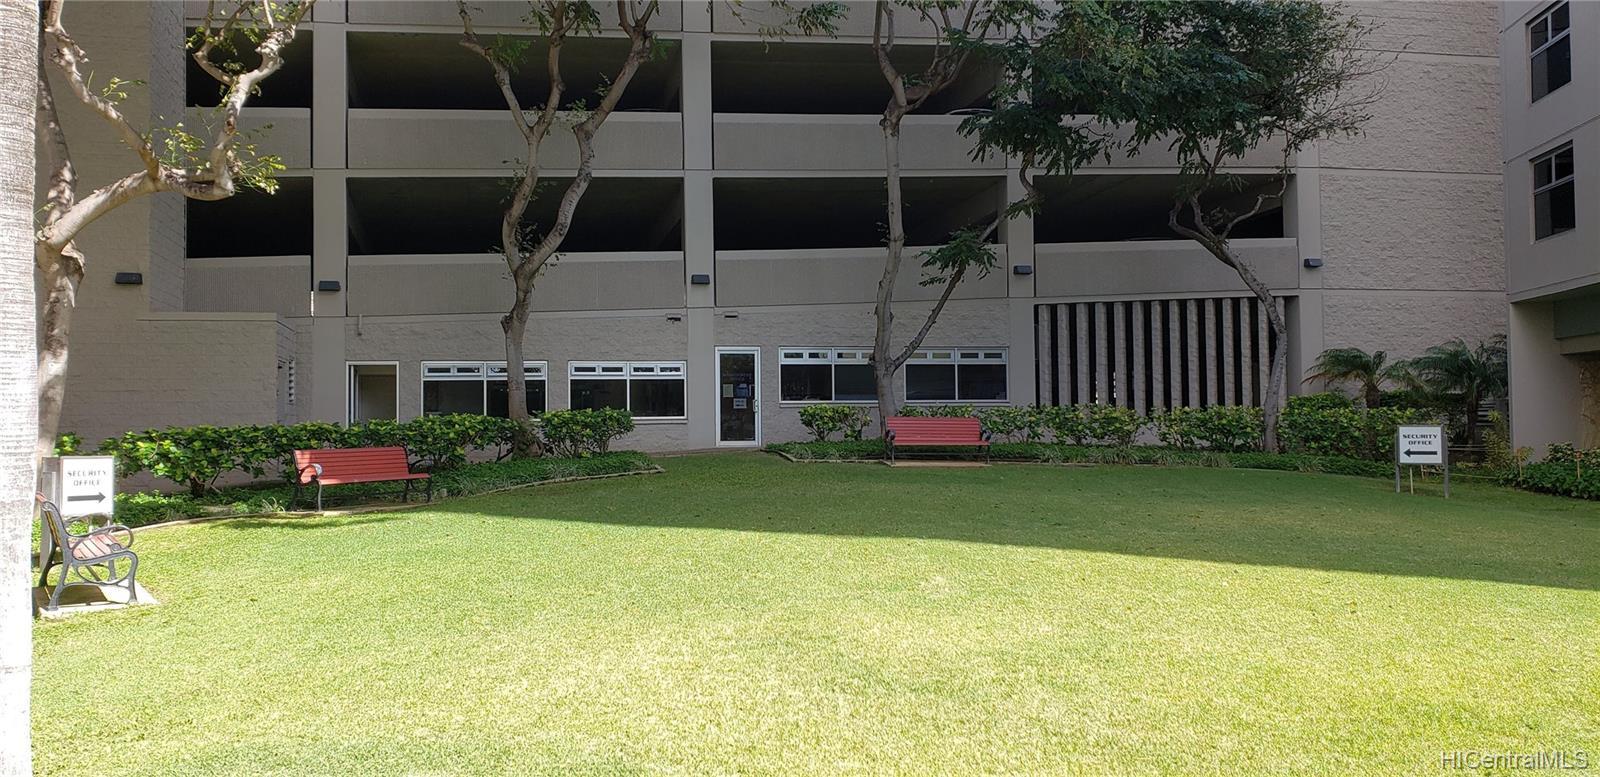 1448 Young St condo # 1802, Honolulu, Hawaii - photo 17 of 22